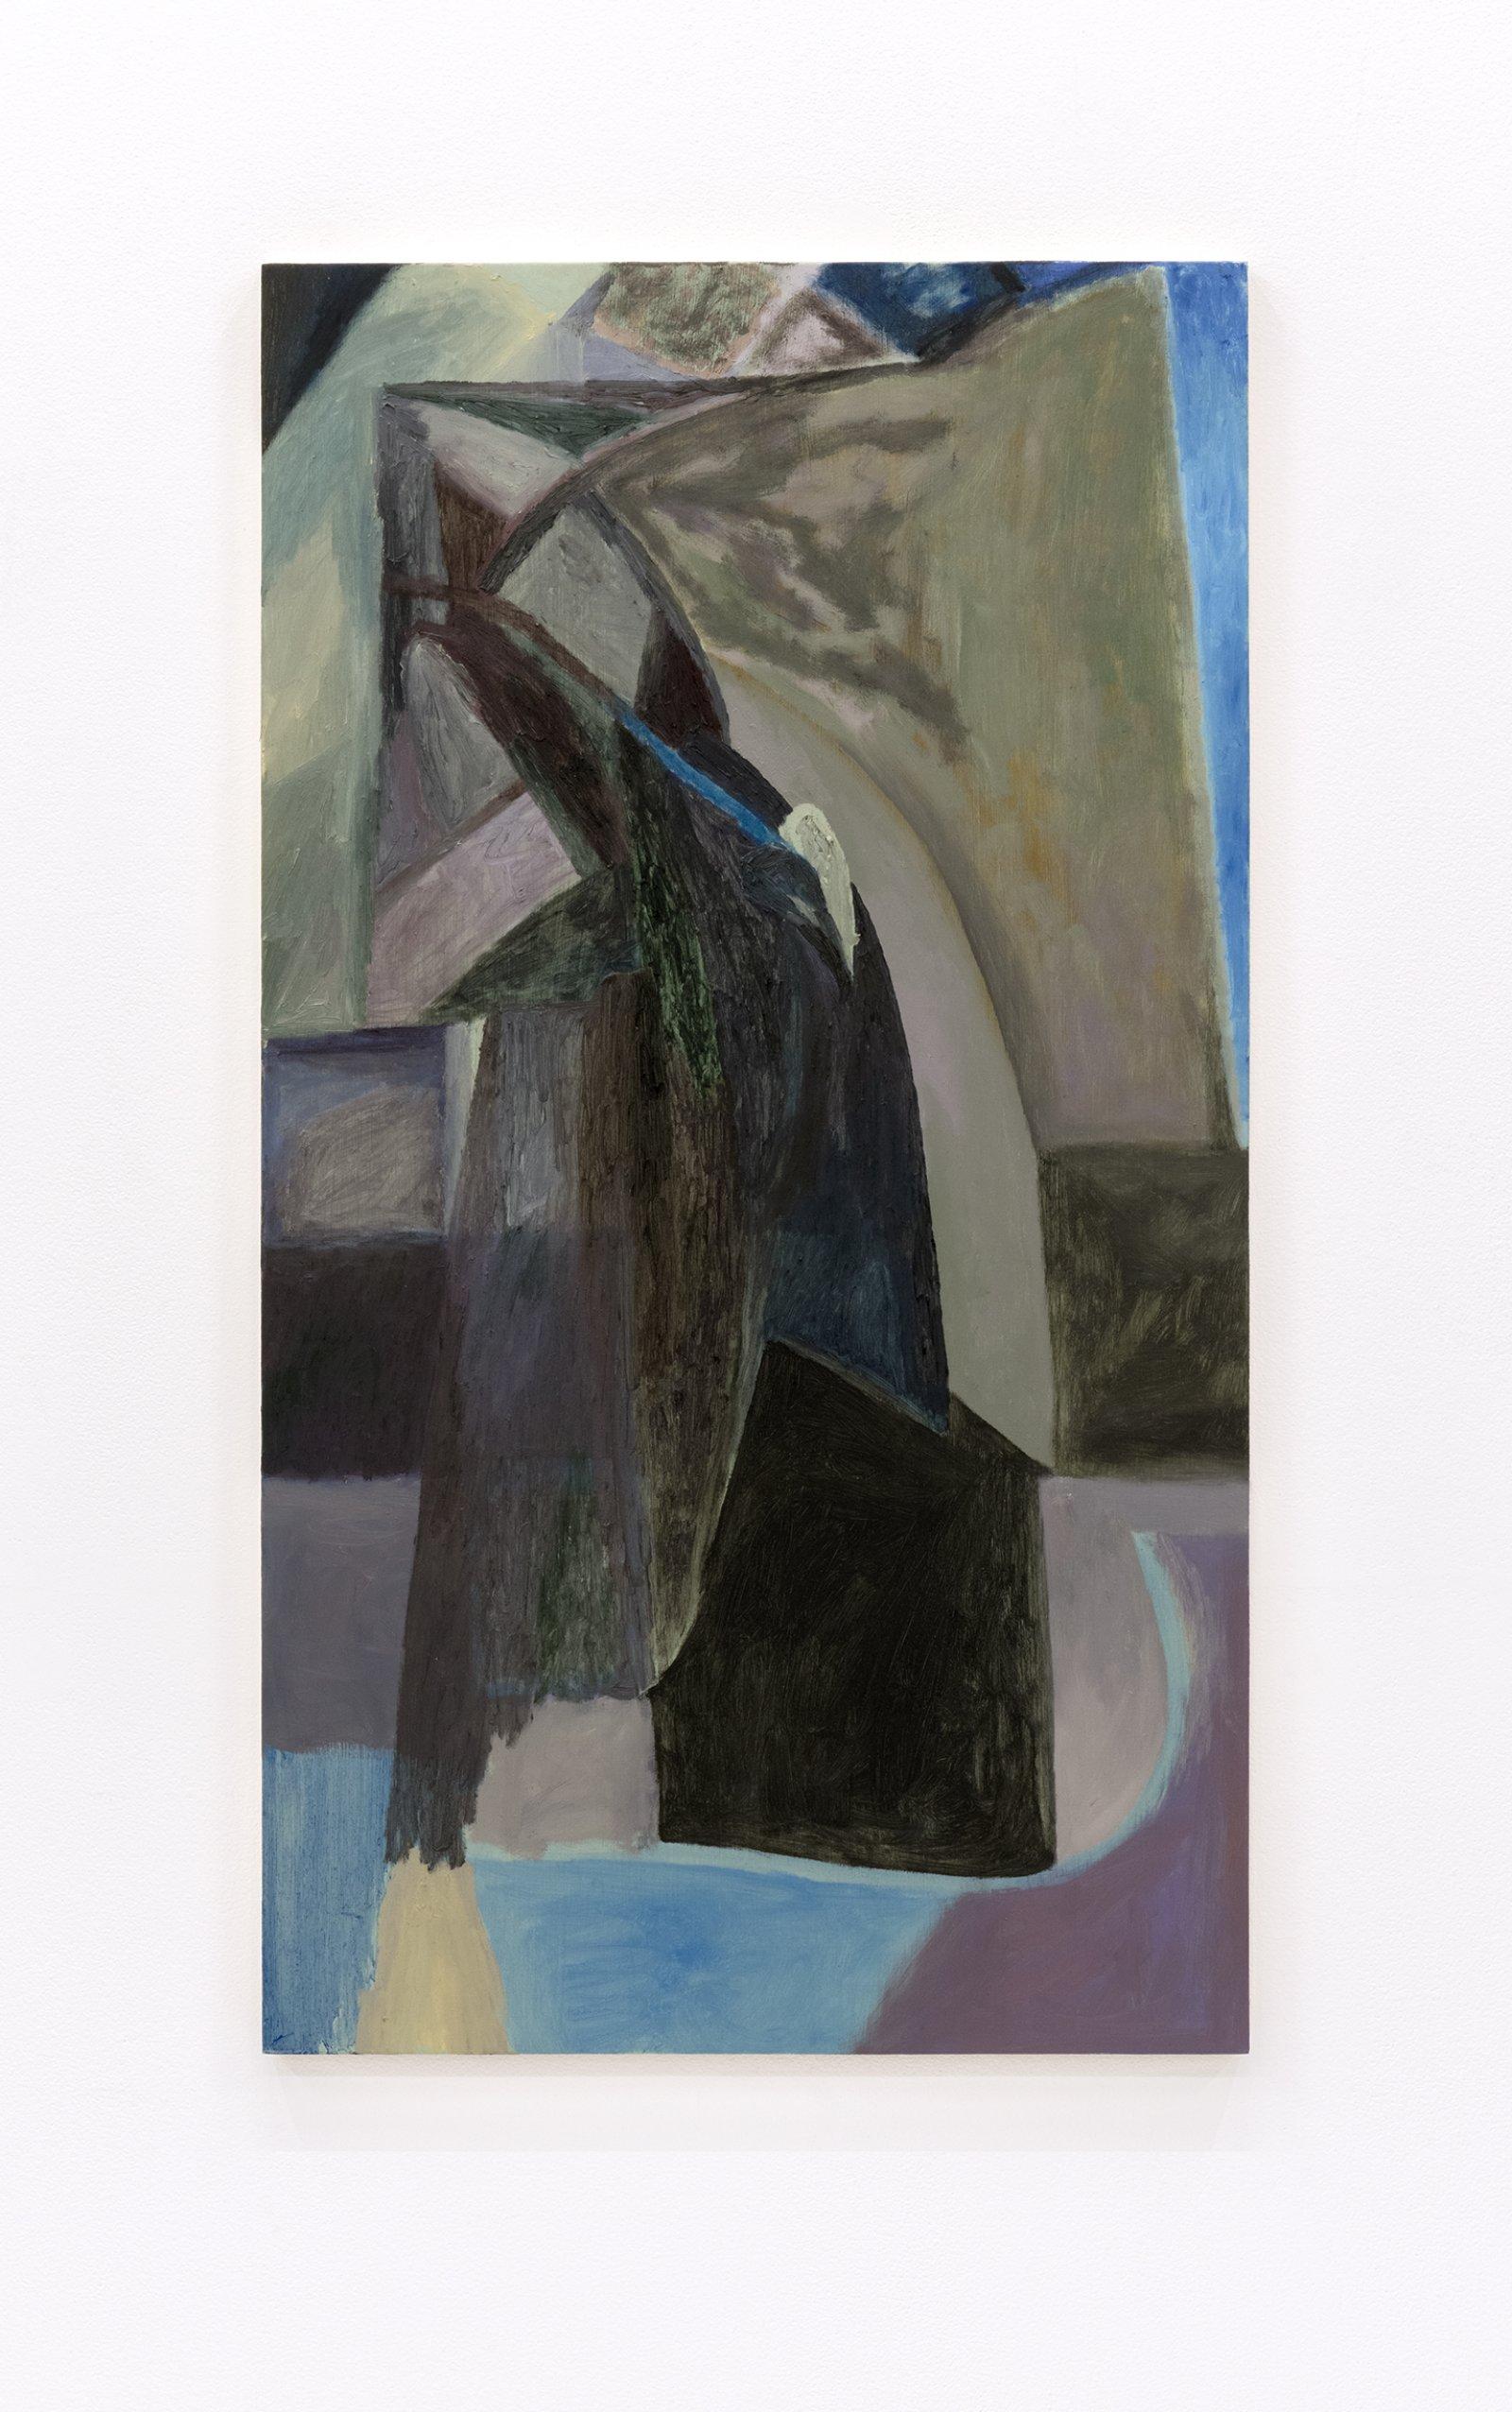 Rebecca Brewer, Remote Genre, 2012, oil on panel, 42 x 24 in. (107 x 60 cm)